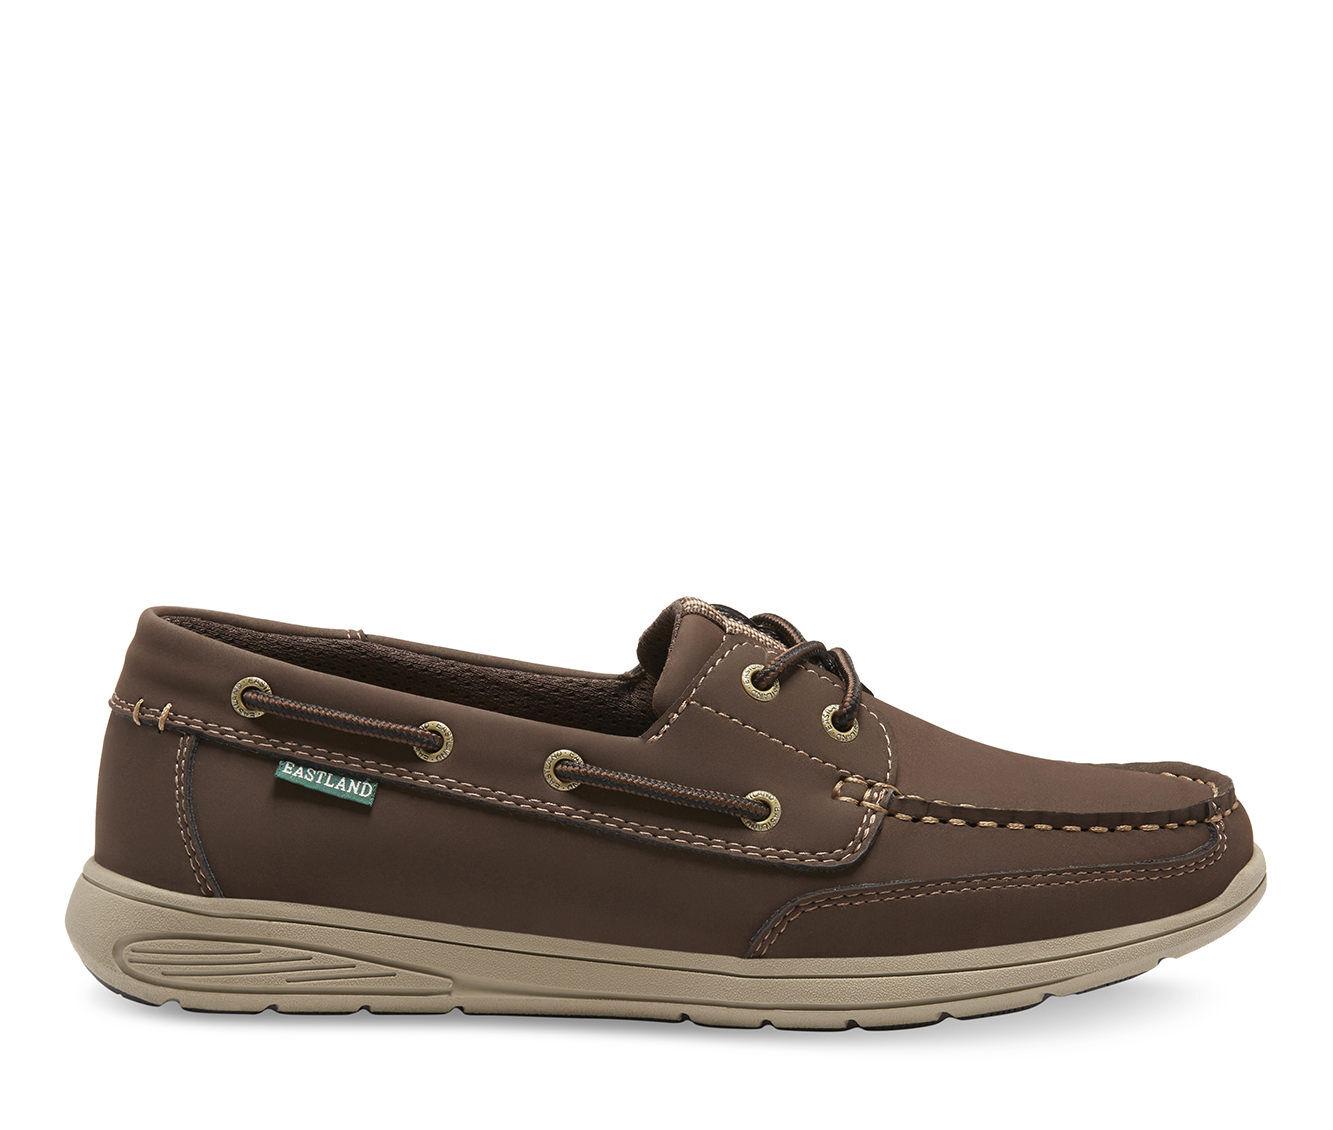 uk shoes_kd1044